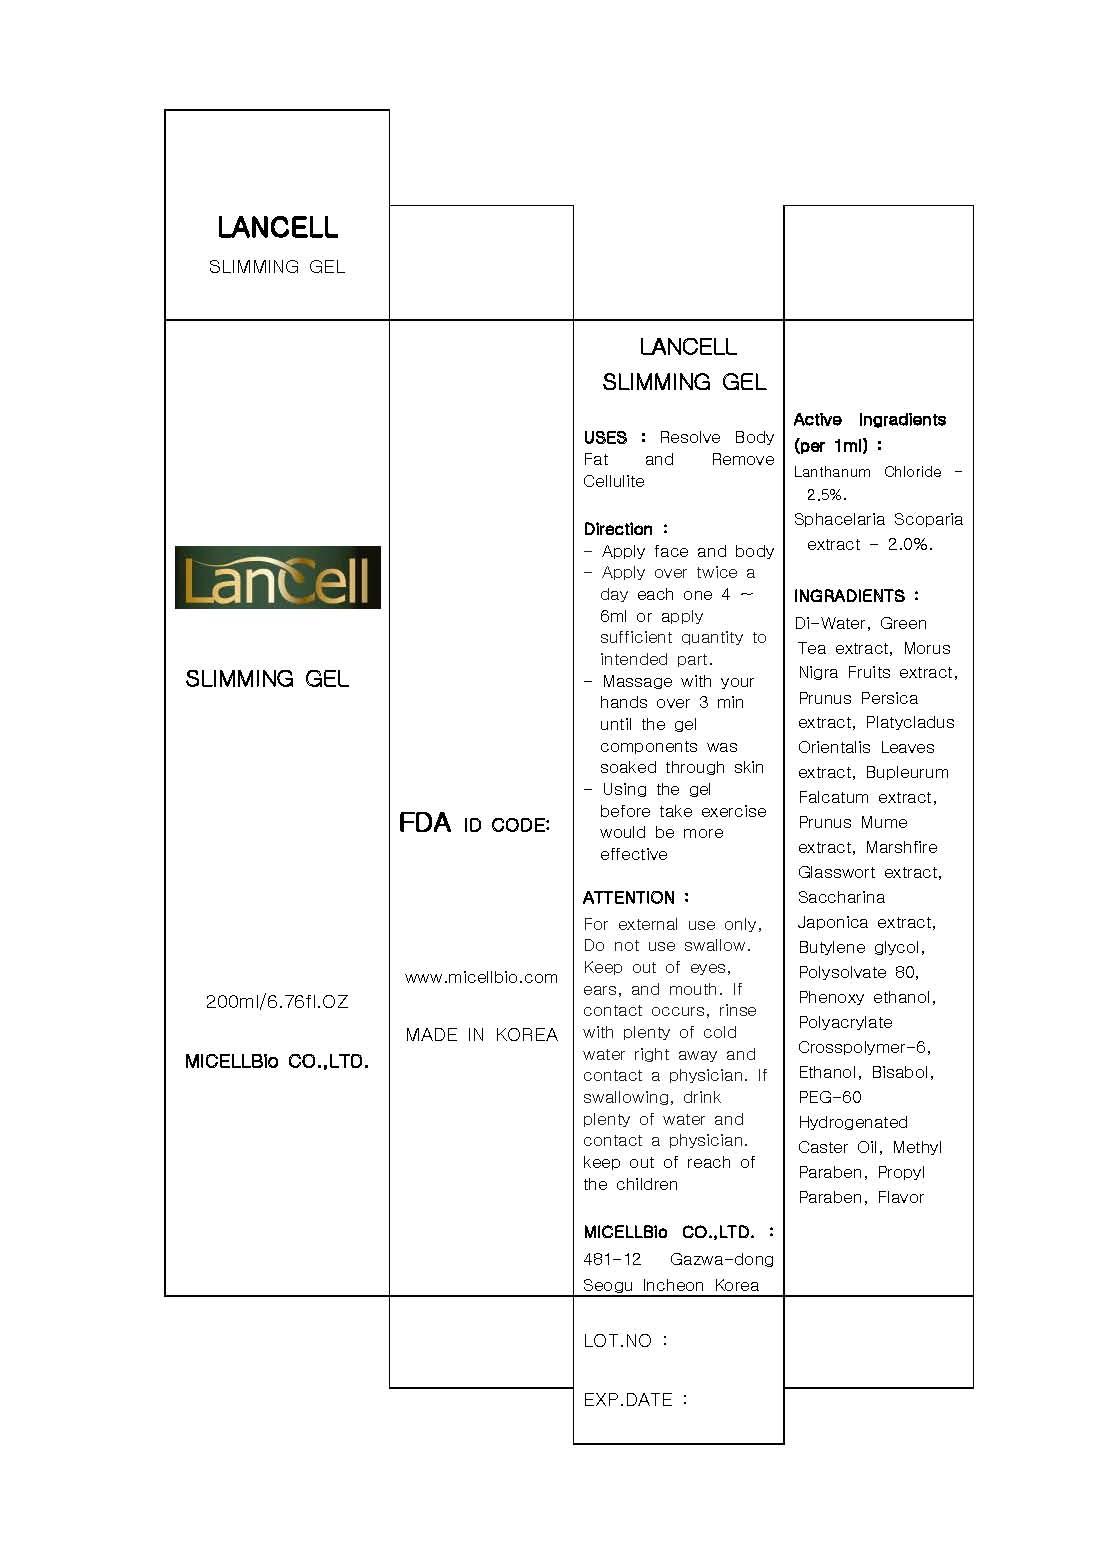 Lancell Slimming (Lanthanum Chloride) Gel [Micellbio Co., Ltd]